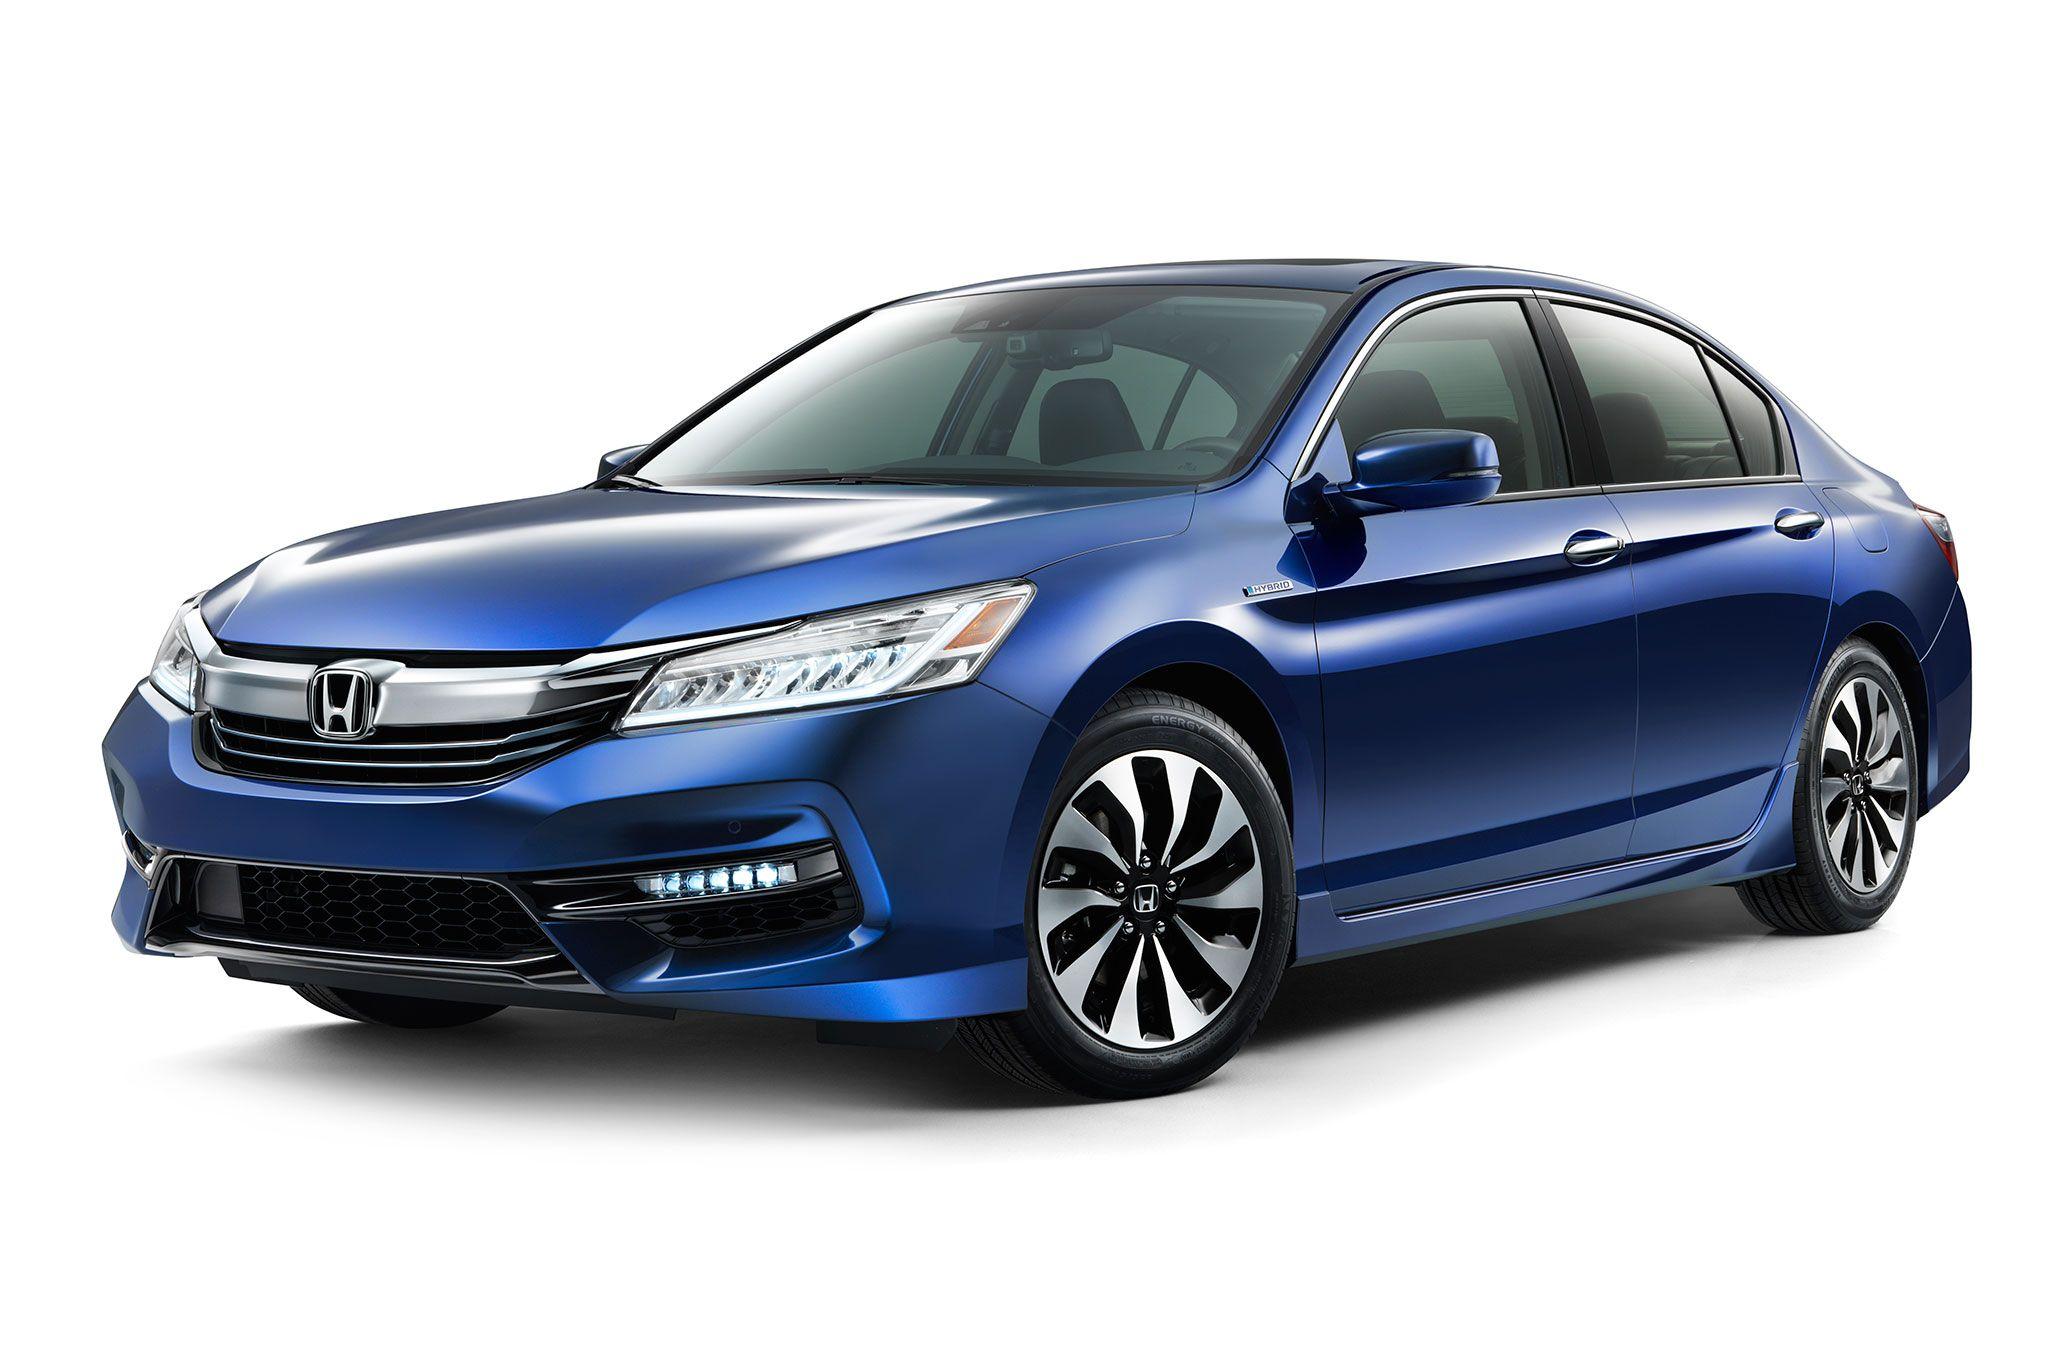 2017 Honda Accord Hybrid Gets More Power, Improved